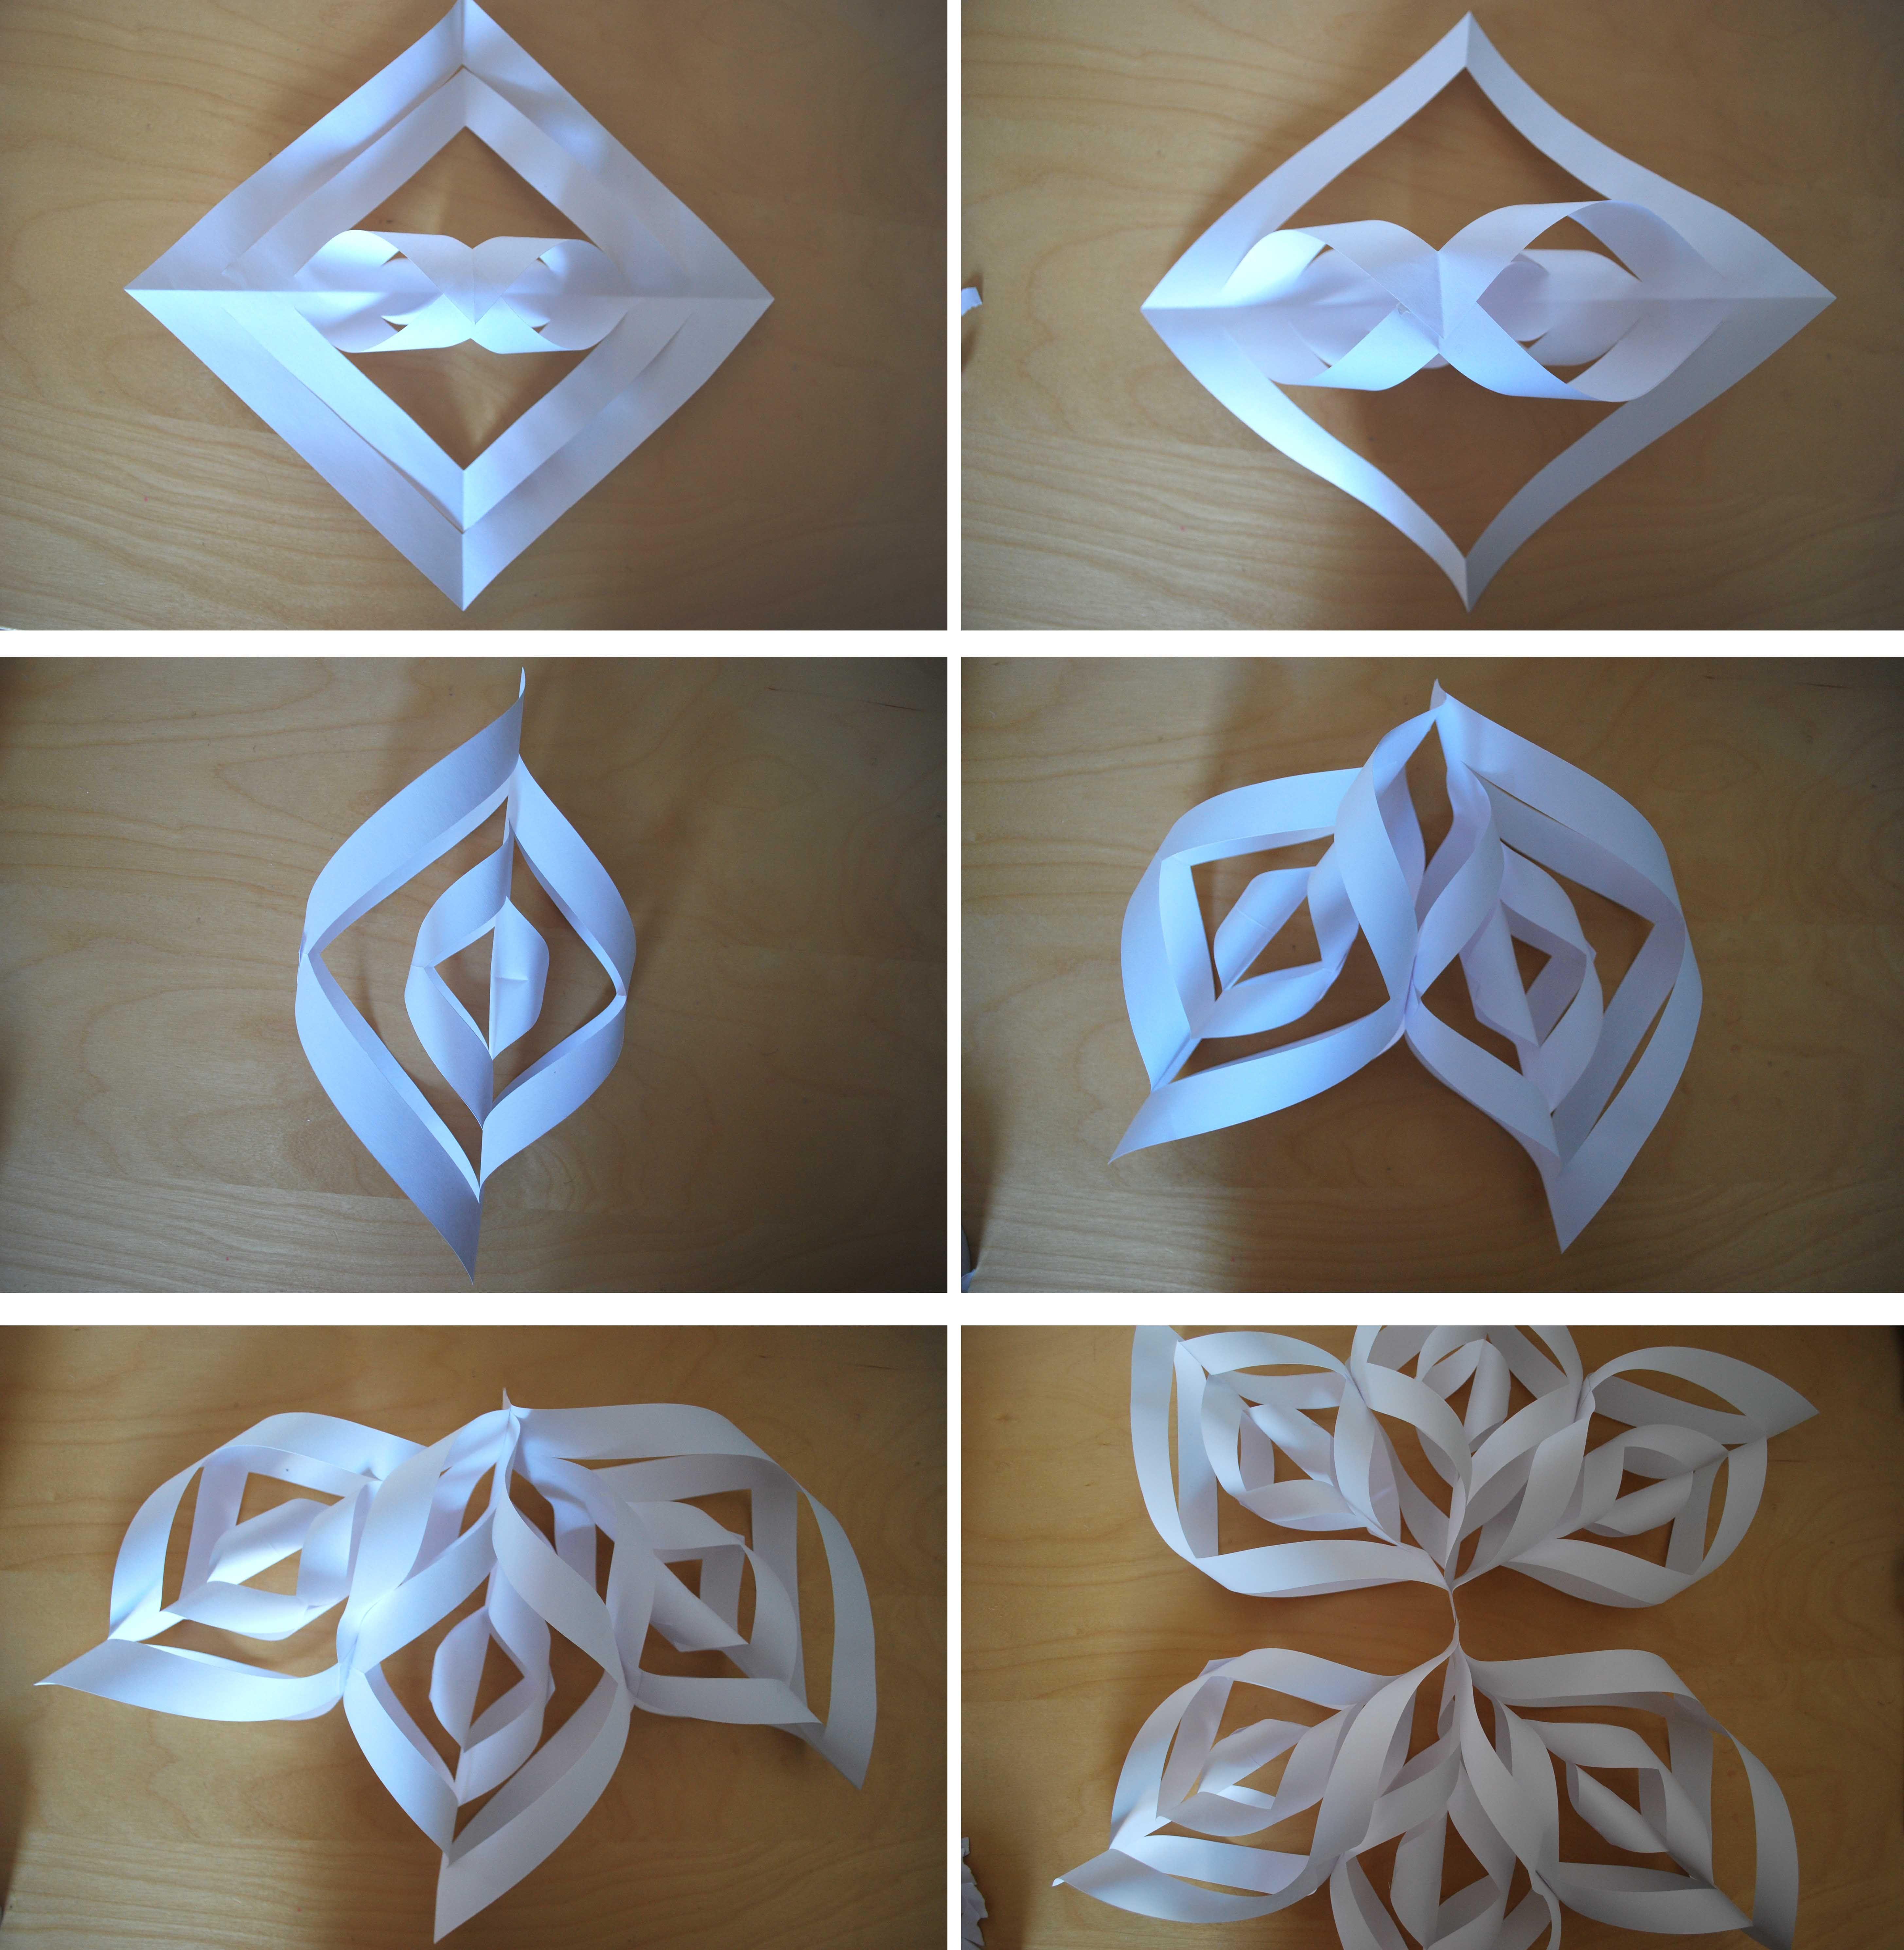 Снежинка из бумаги пошагово в фото